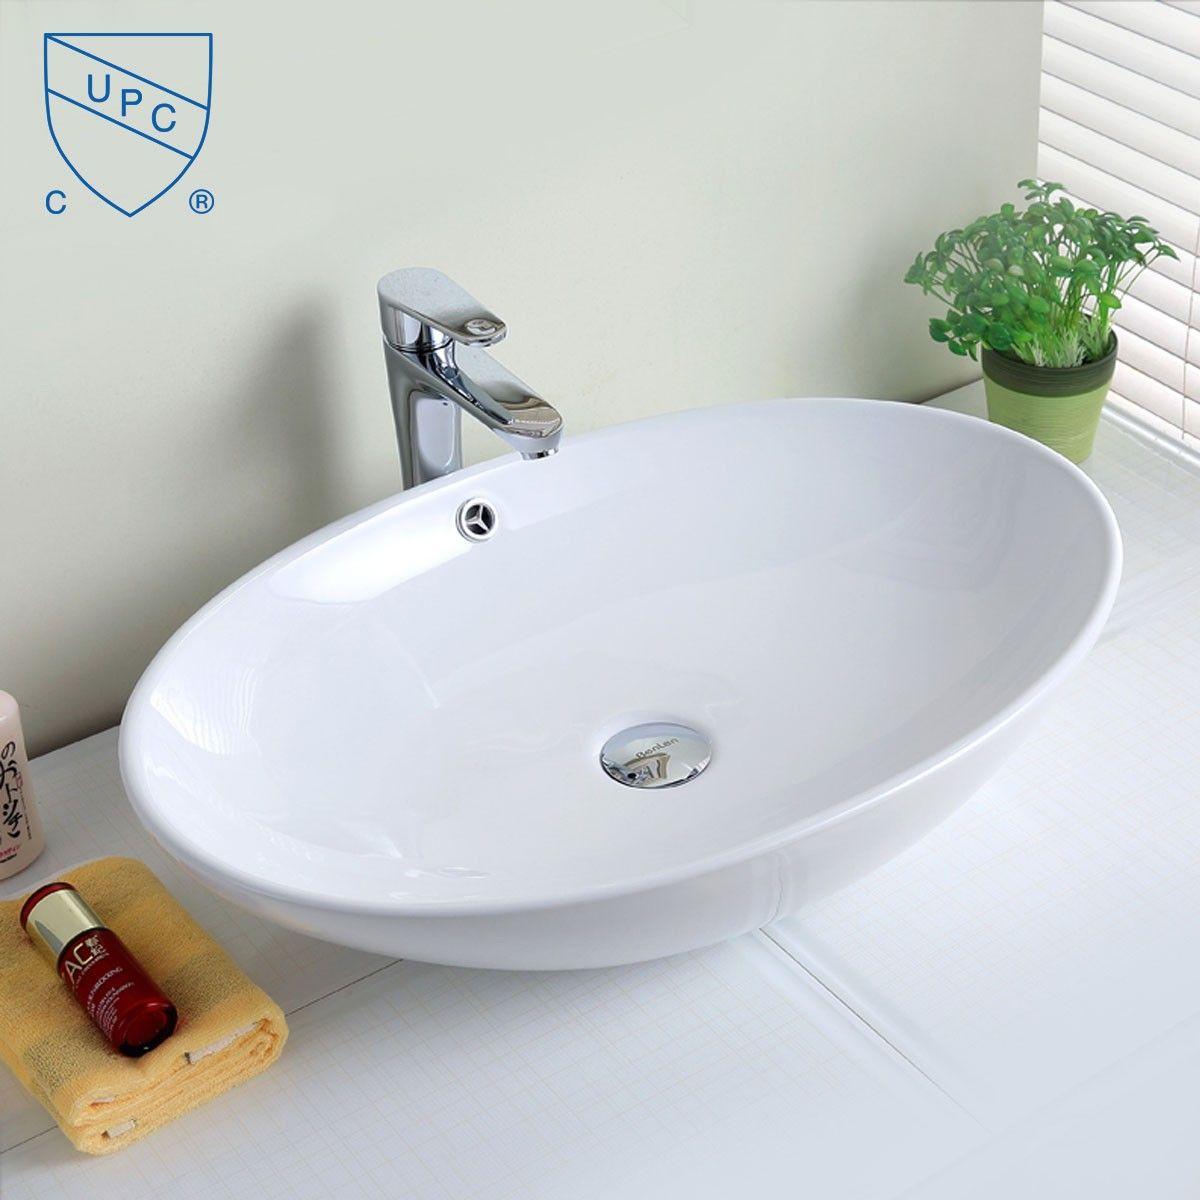 Lavabo vasque ovale de dessus de comptoir en c ramique for Dessus de comptoir de salle de bain